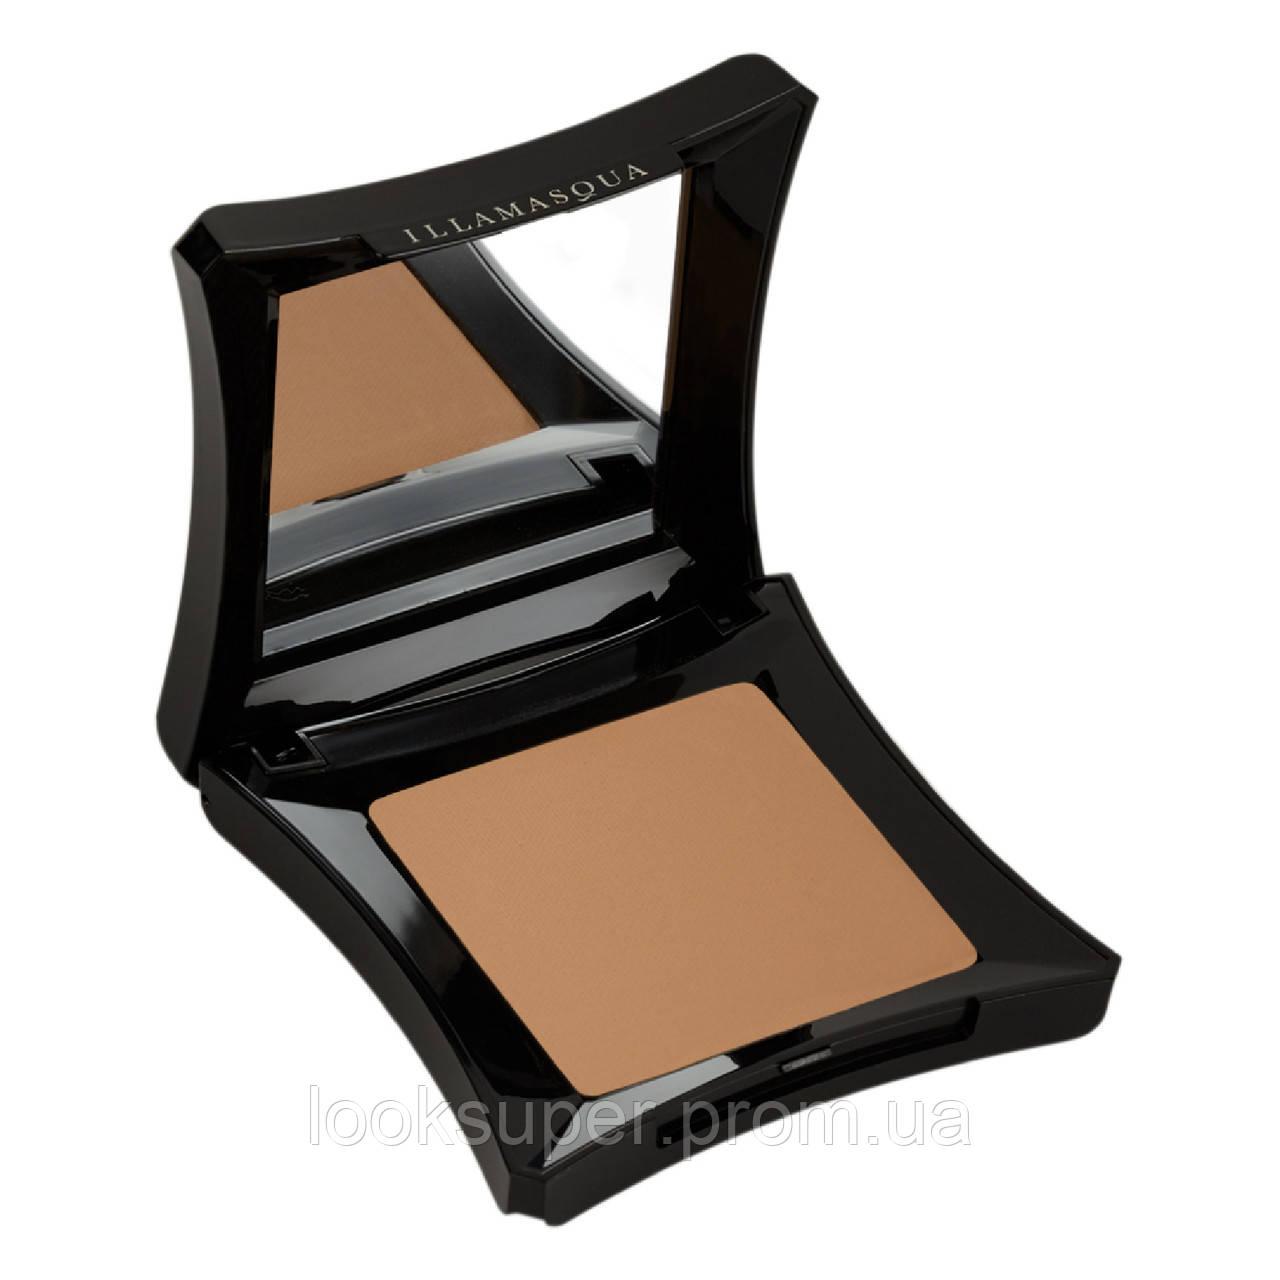 Пудра основа под макияж Illamasqua POWDER FOUNDATION  215